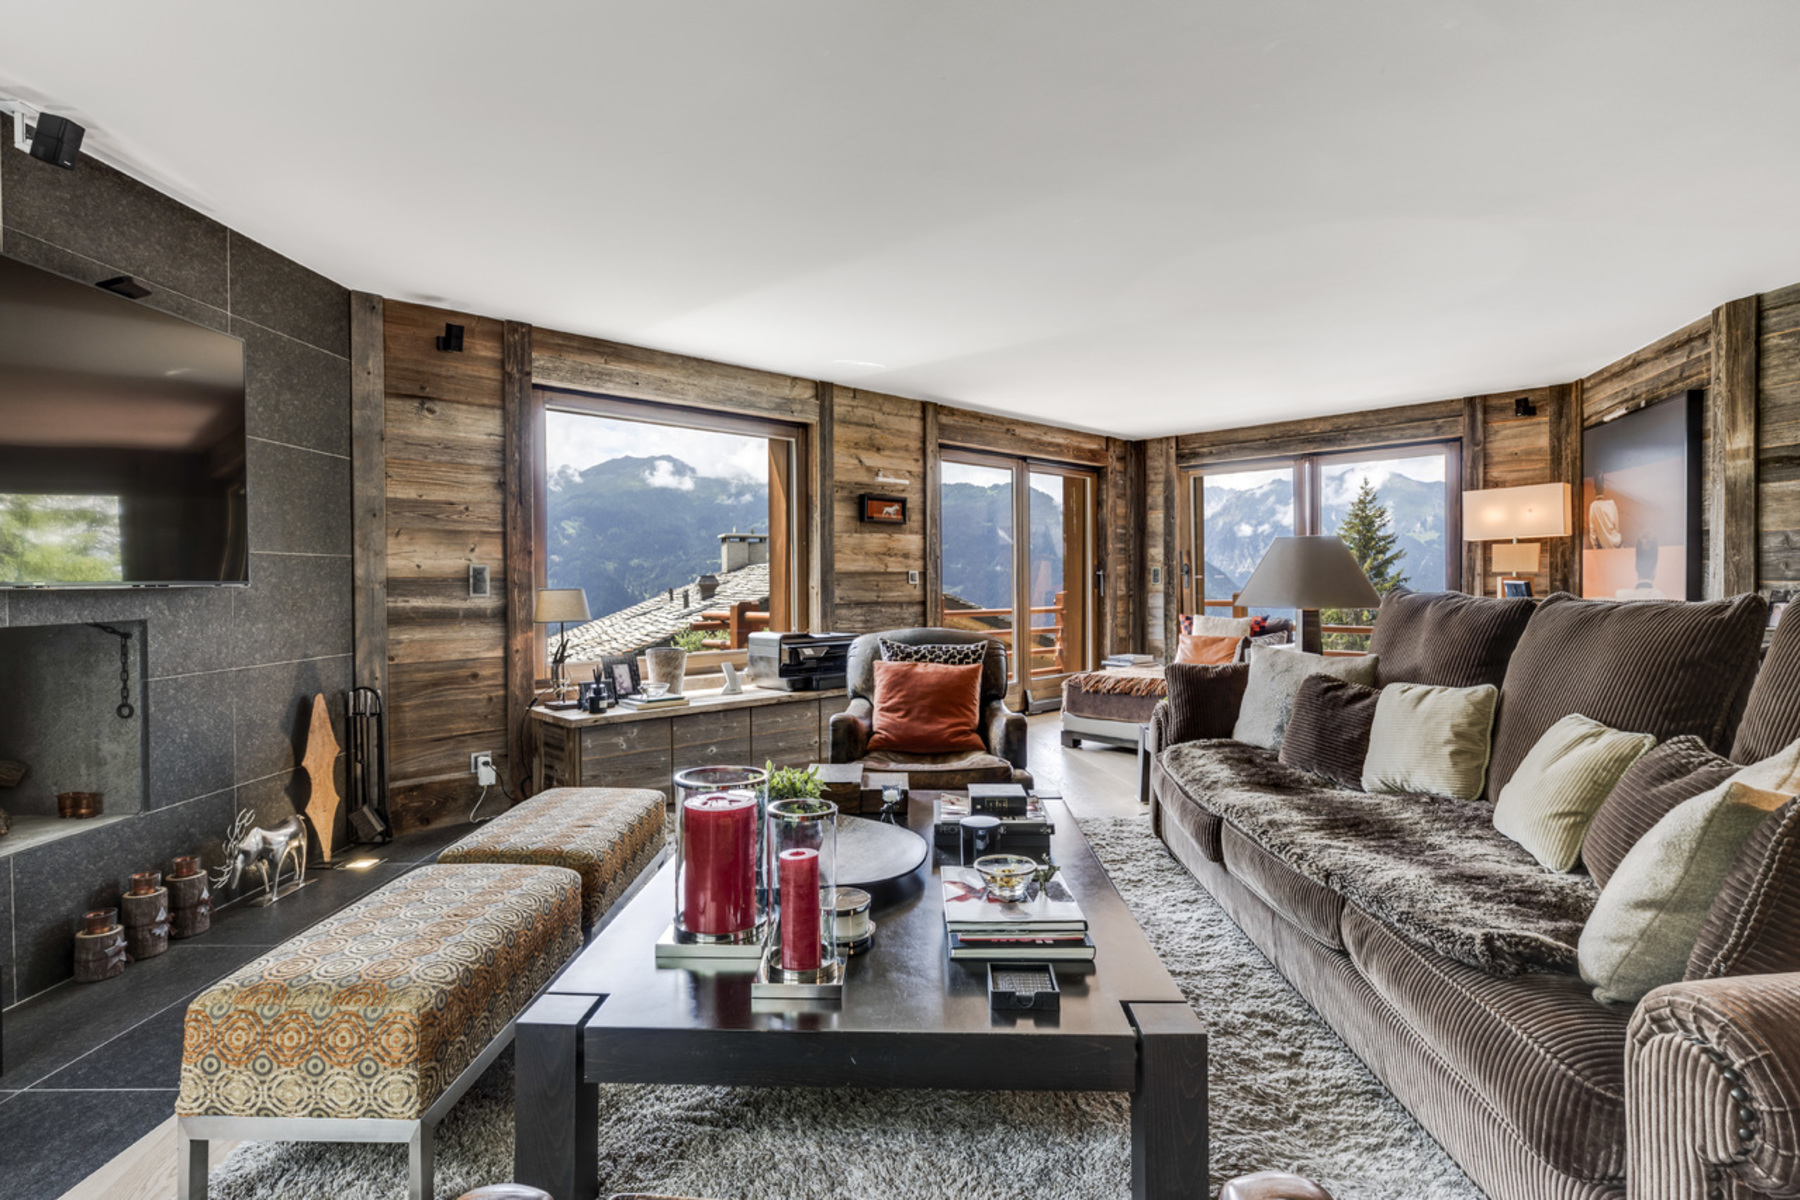 Apartment for Sale at GRANDS DUCS 326 Switzerland Verbier, Valais, 1936 Switzerland